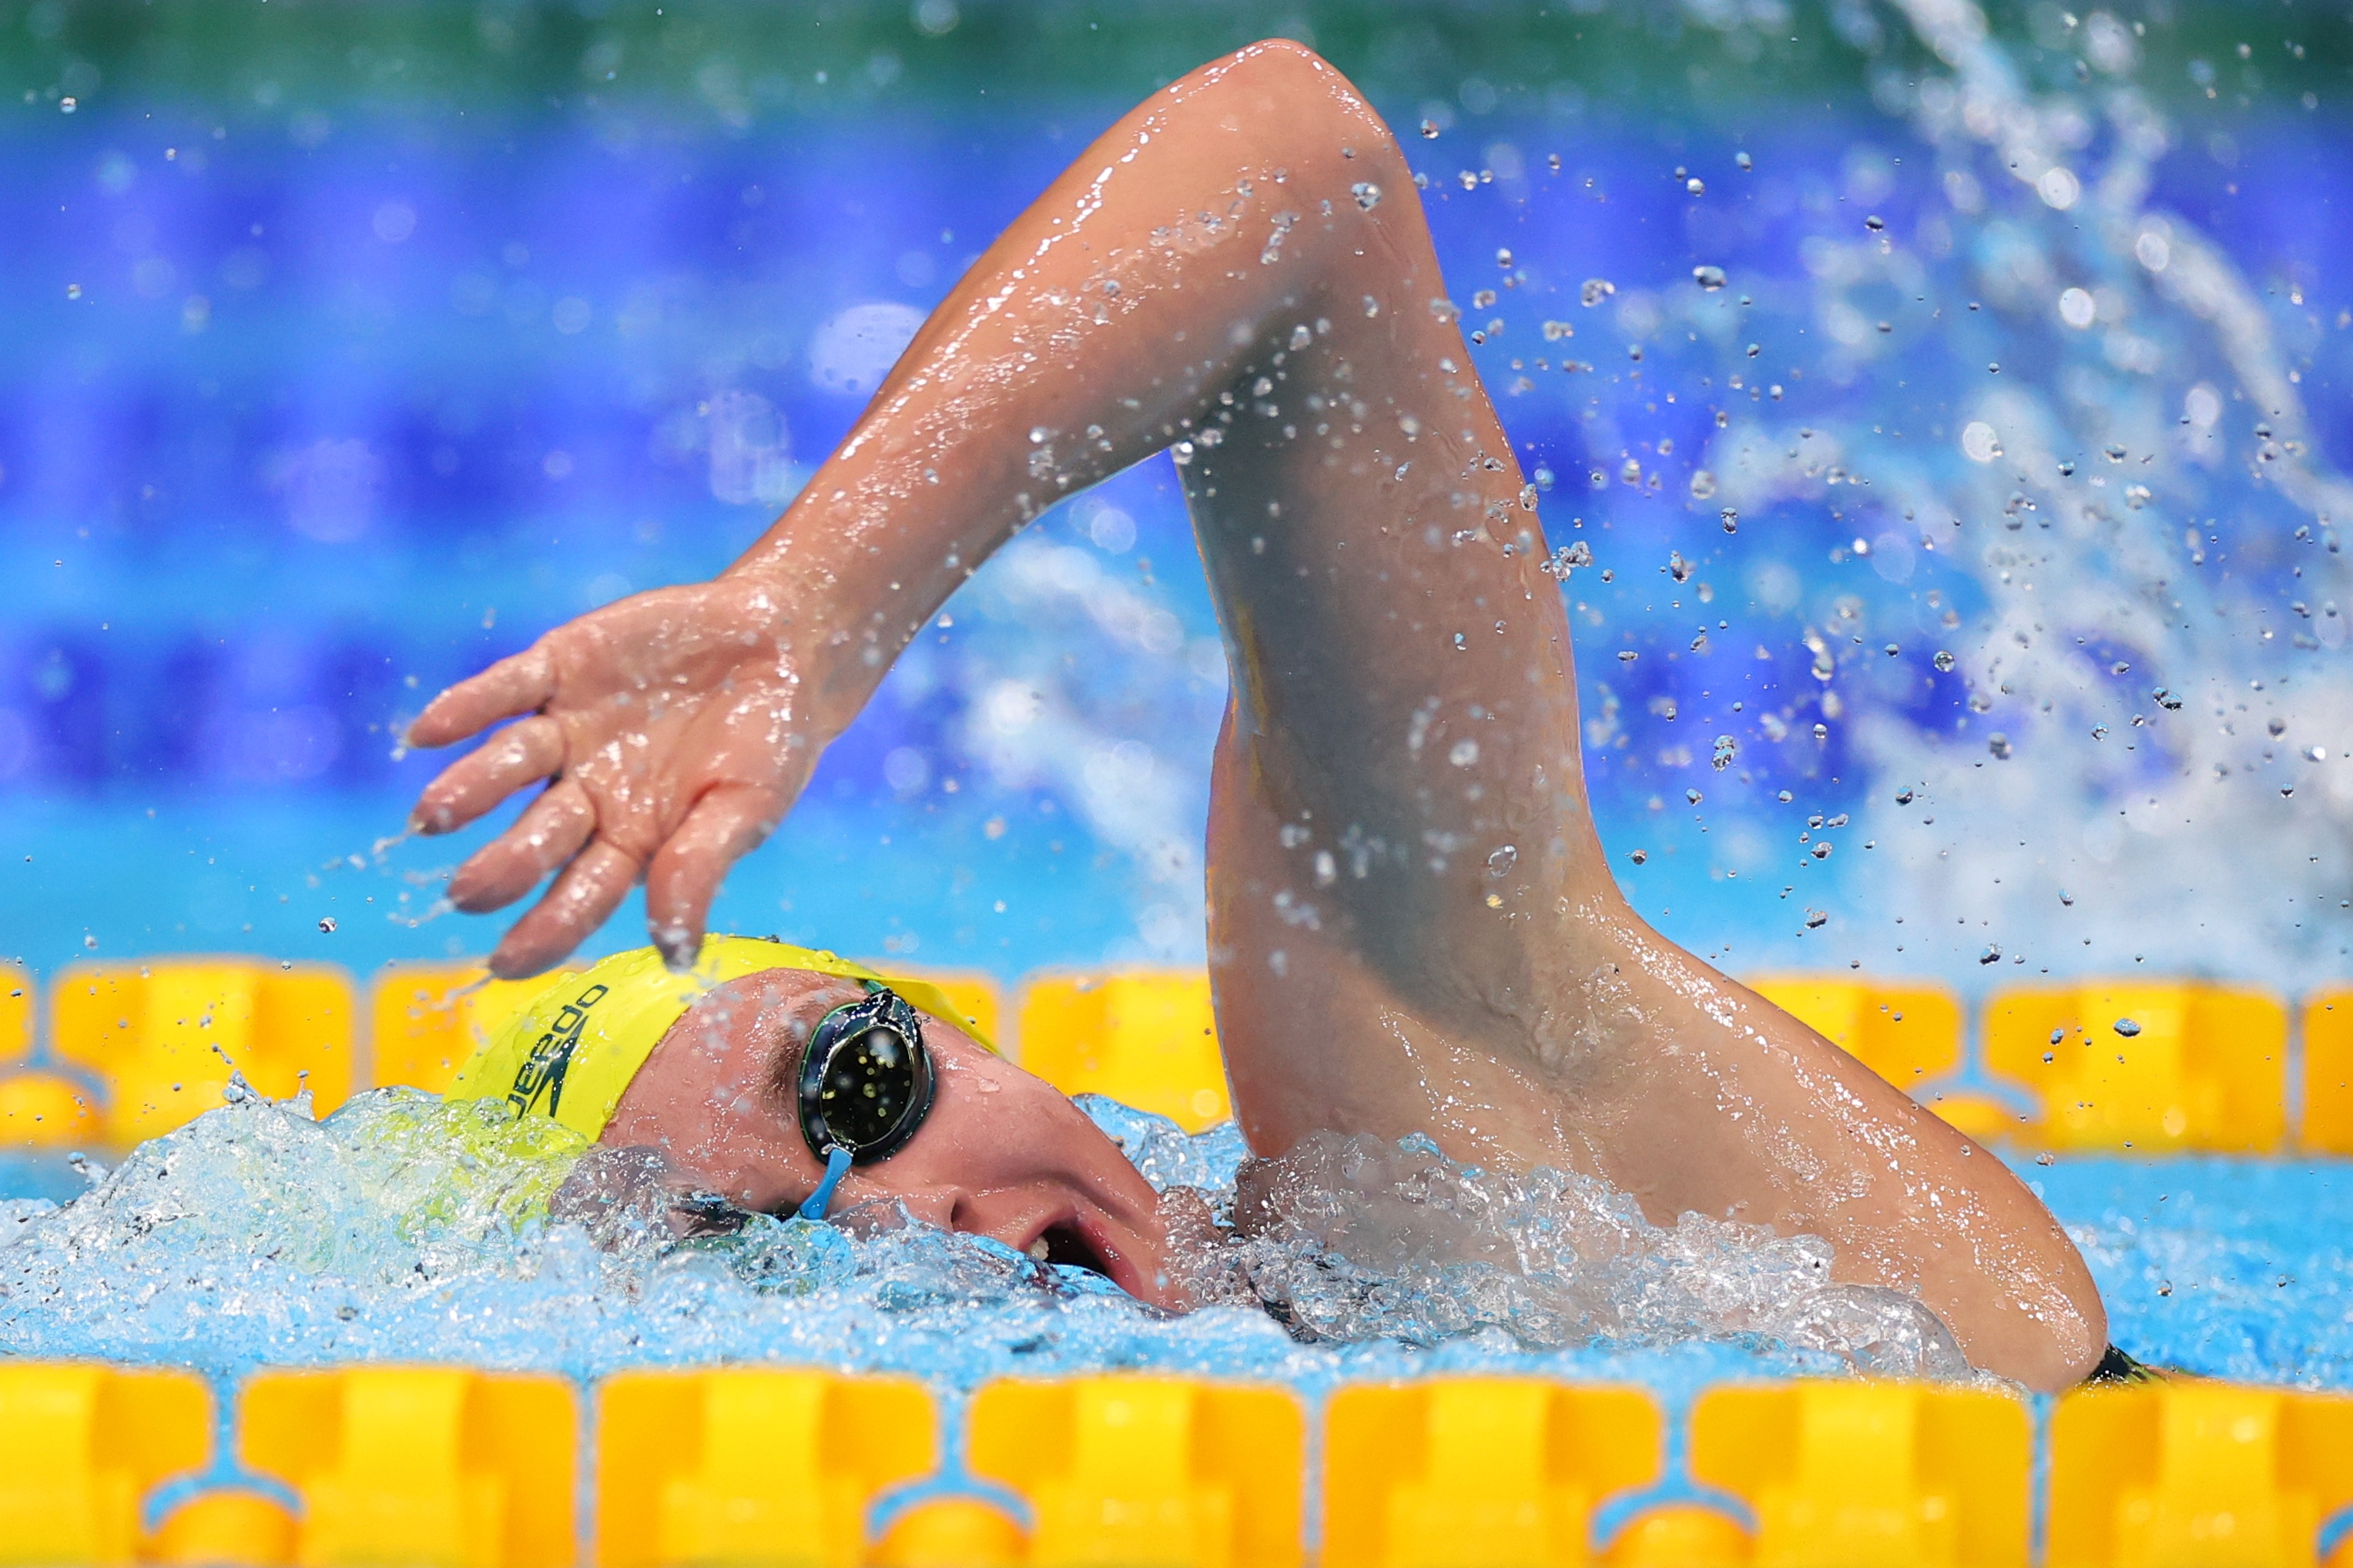 Tokyo 2020 Olympics - Swimming - Women's 800m Freestyle - Heats - Tokyo Aquatics Centre - Tokyo, Japan - July 29, 2021. Ariarne Titmus of Australia in action. REUTERS/Marko Djurica